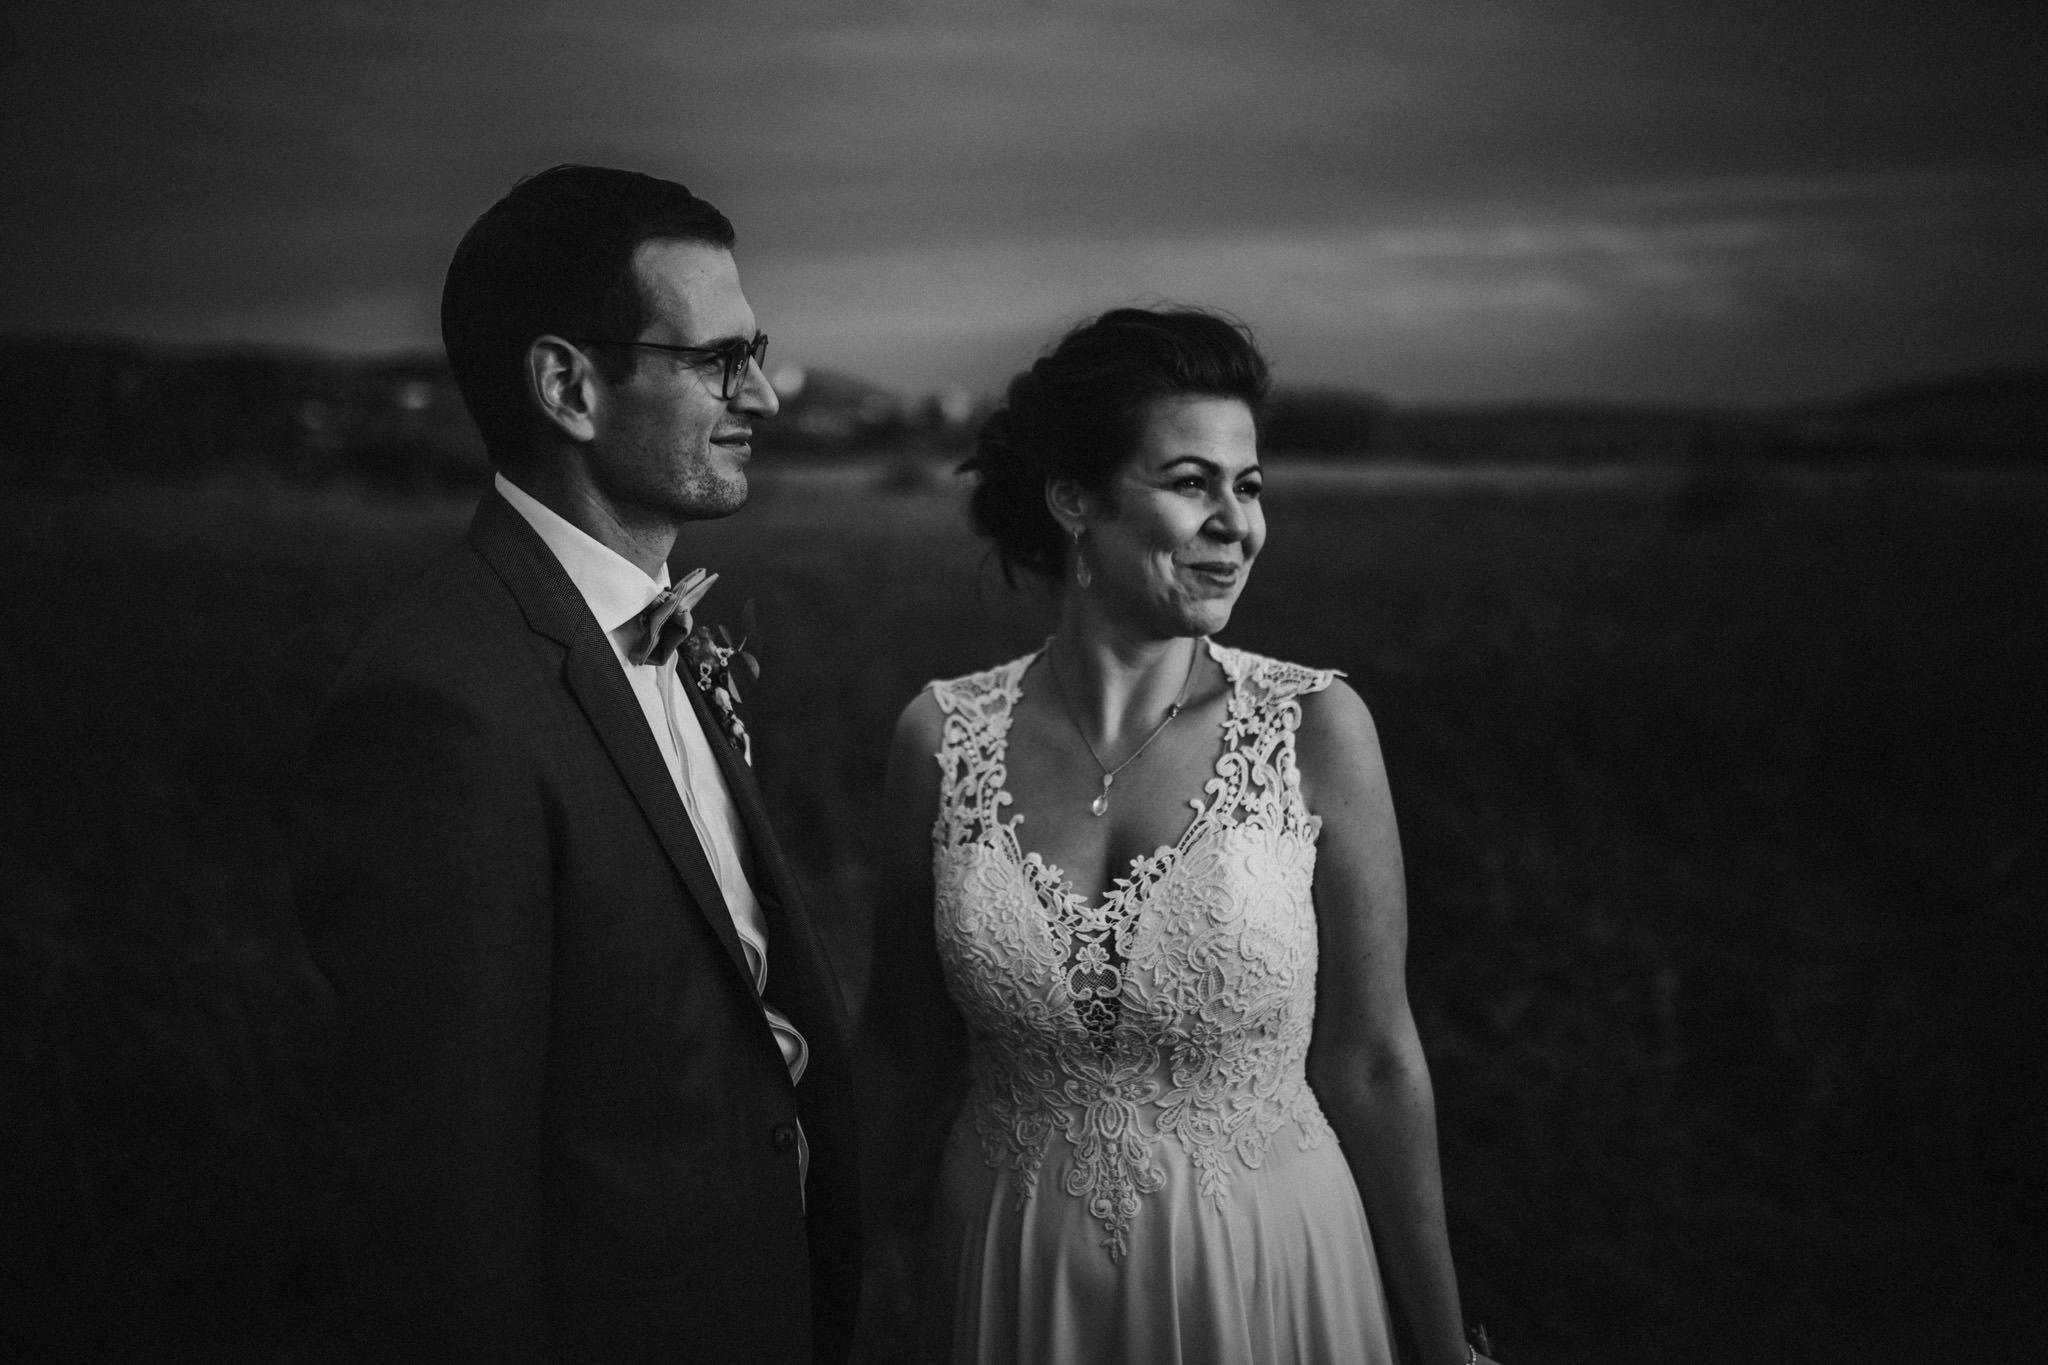 Hochzeitsfotograf-Homberg-50.jpg